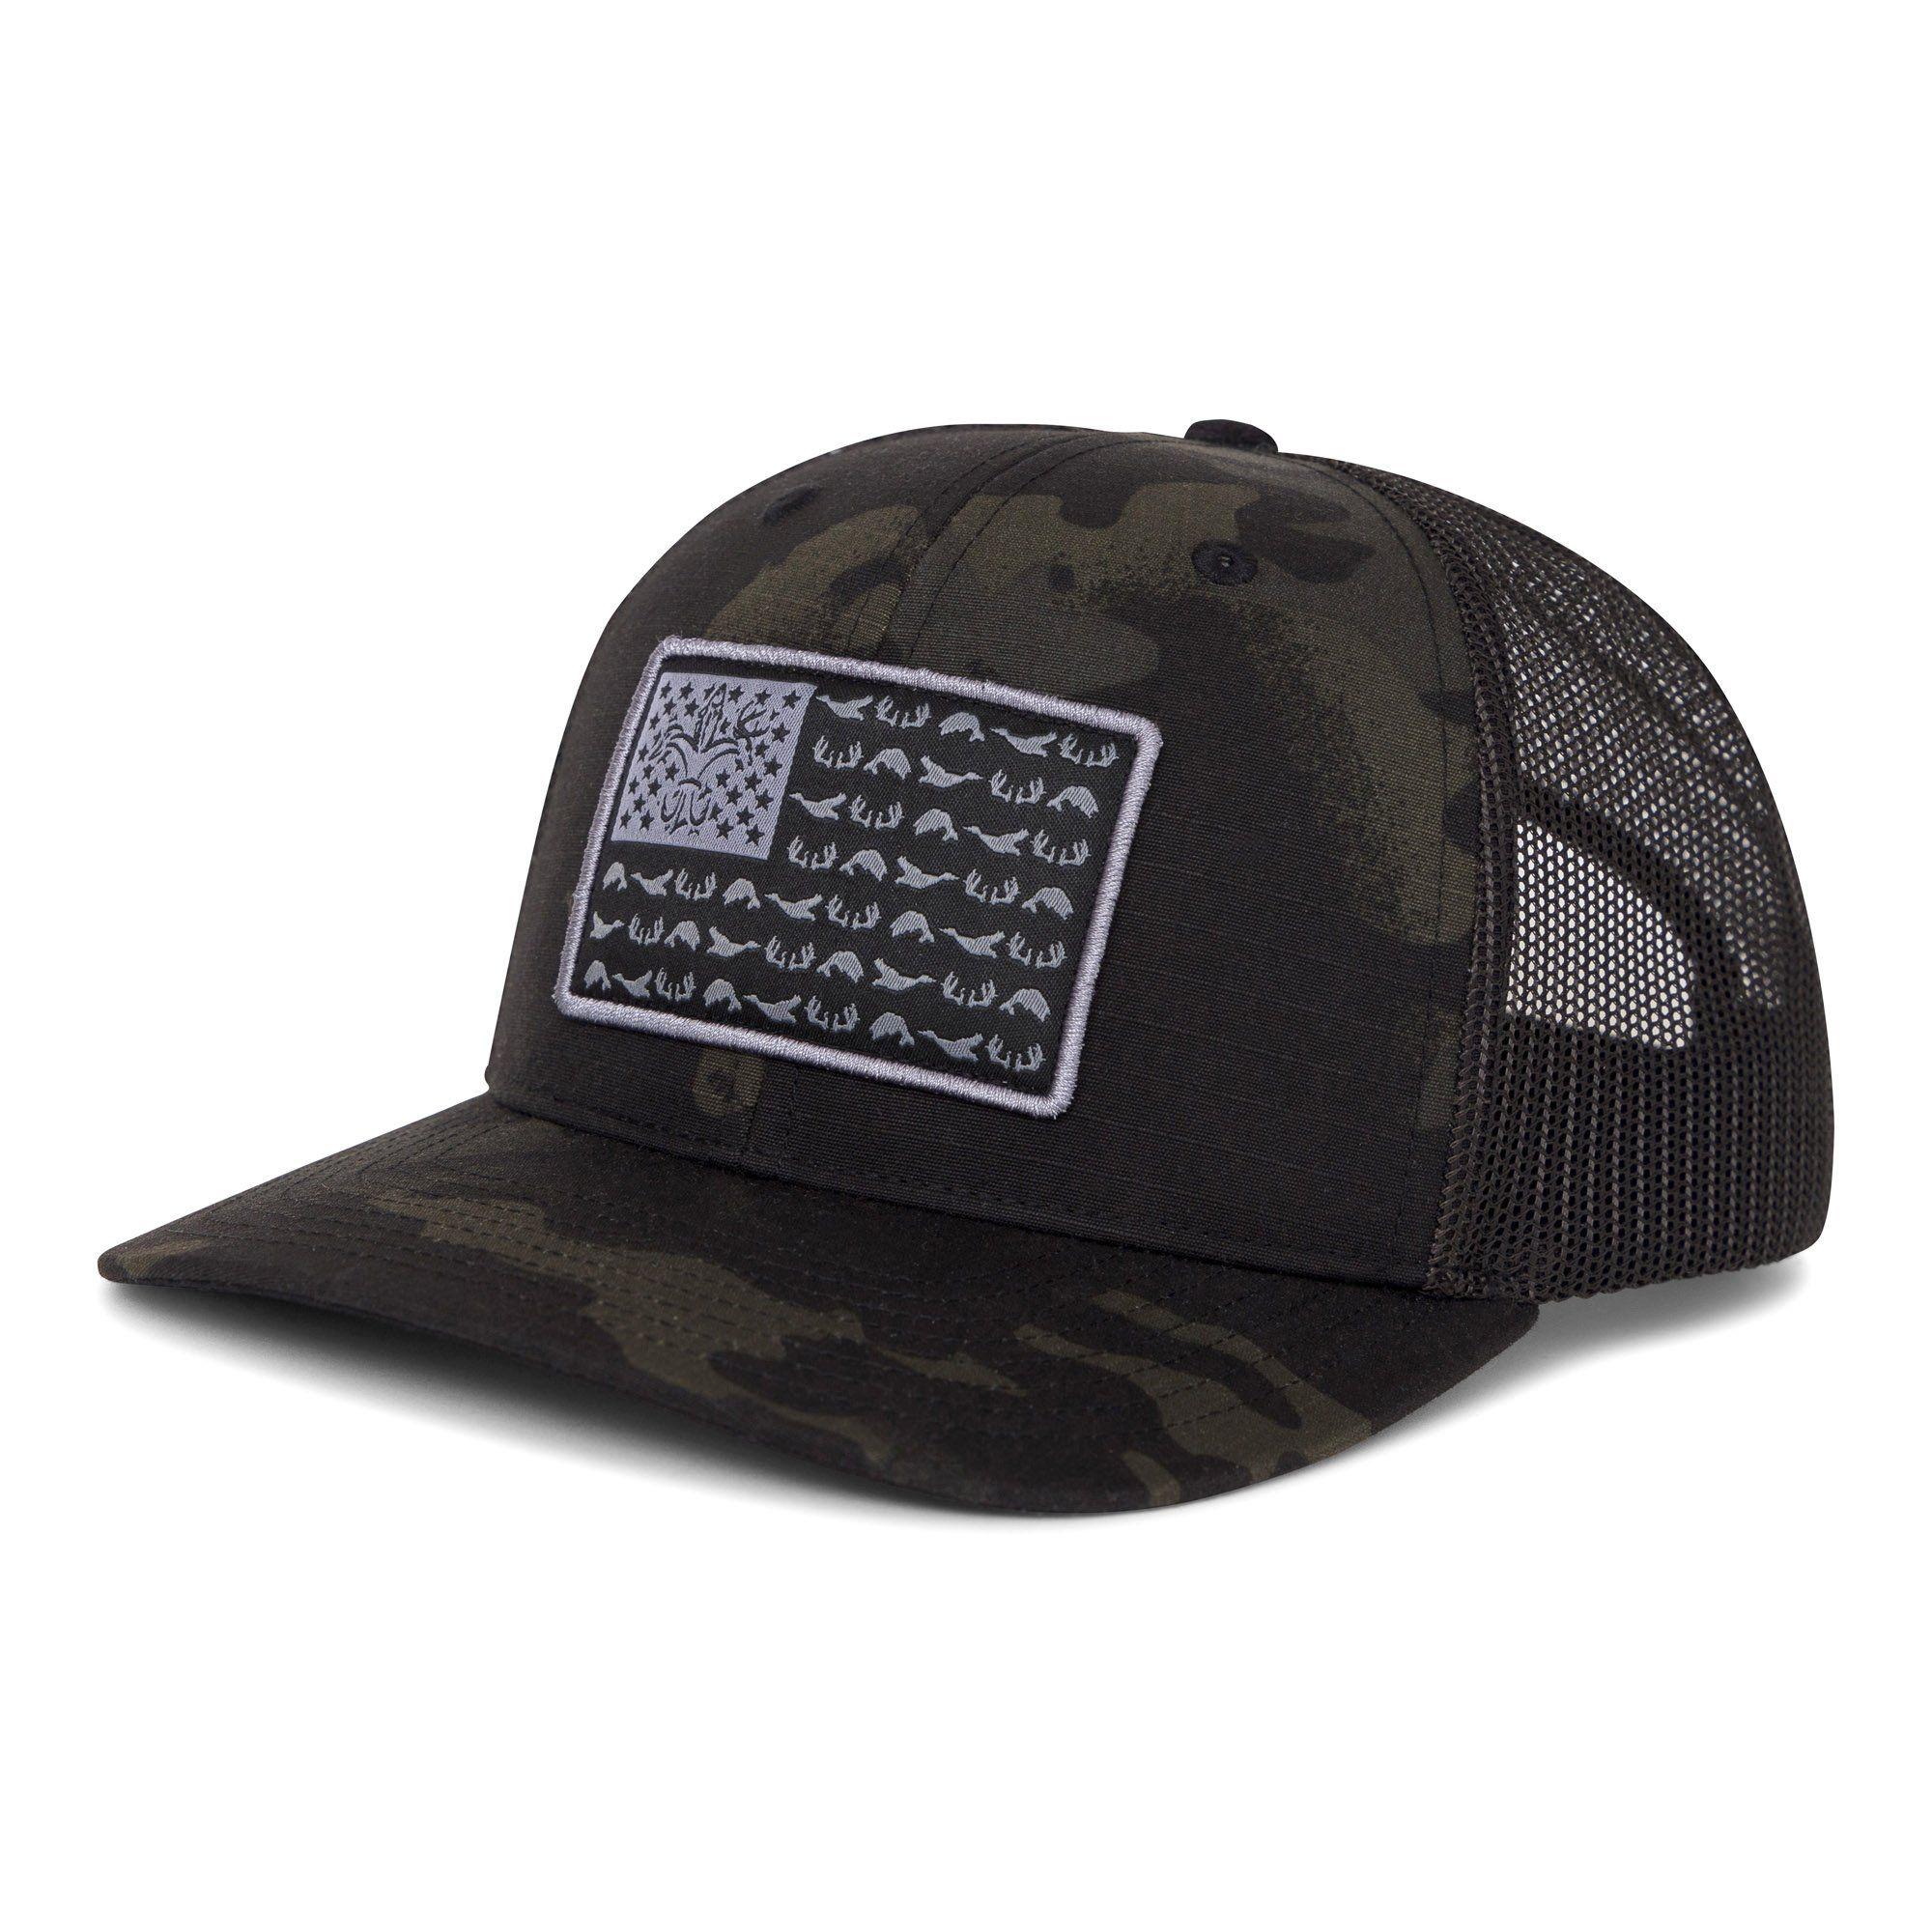 68cca98b6 American Sportsman Mesh Back Hat MultiCam Black / Black in 2019 ...